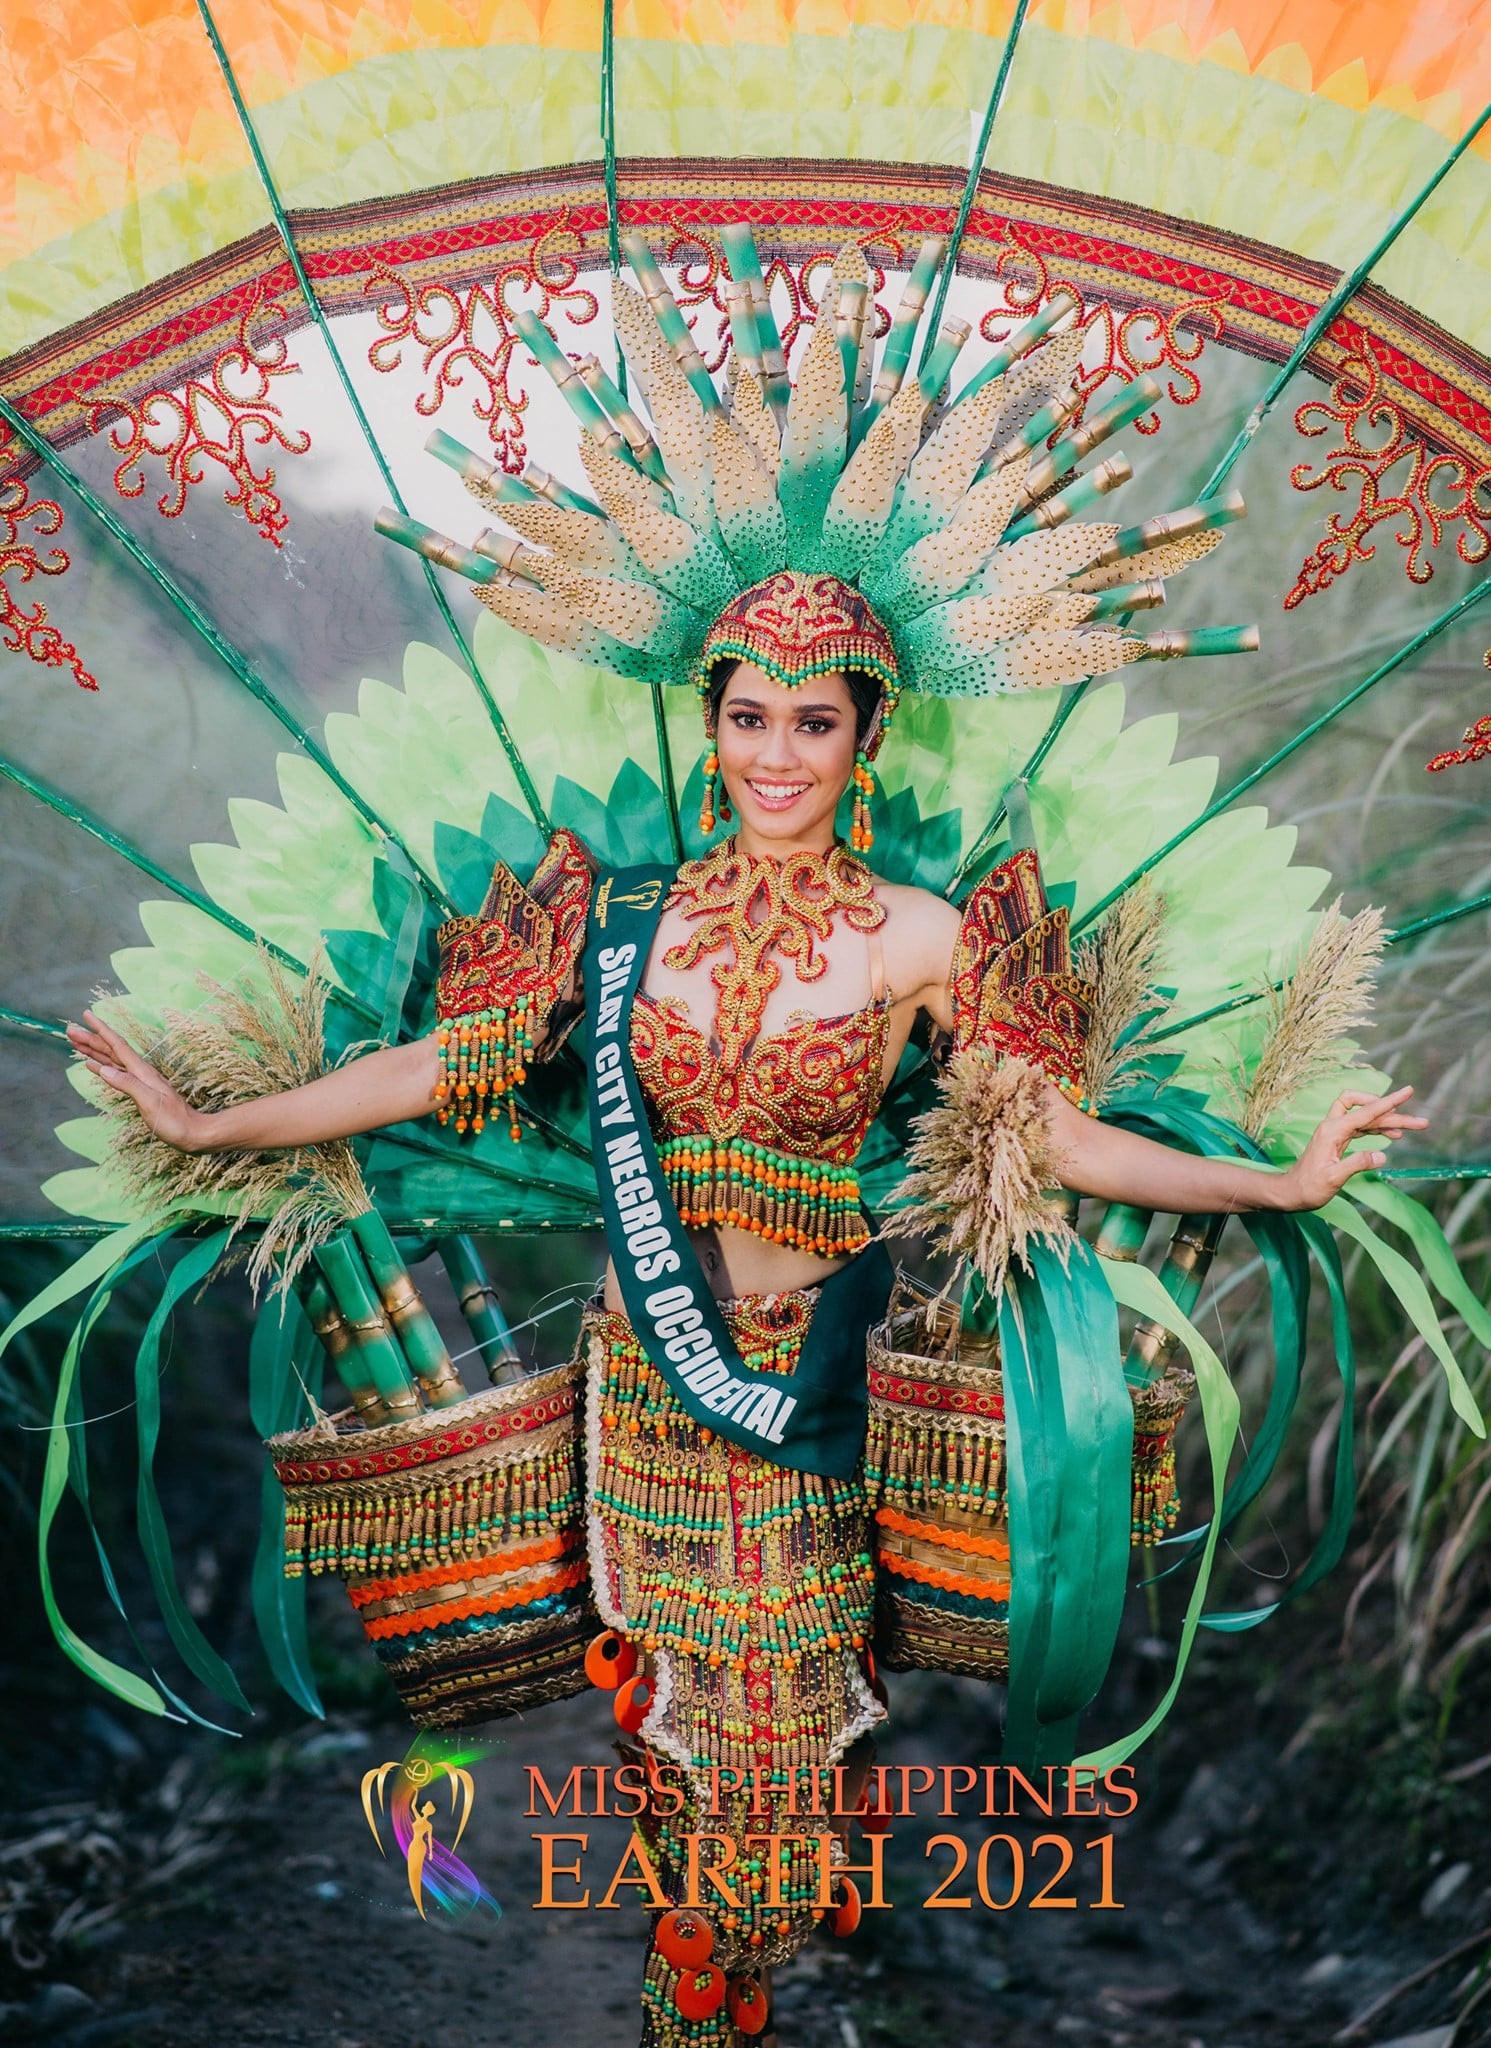 candidatas a miss earth philippines 2021. final: 8 agosto. - Página 17 Ax15Dg